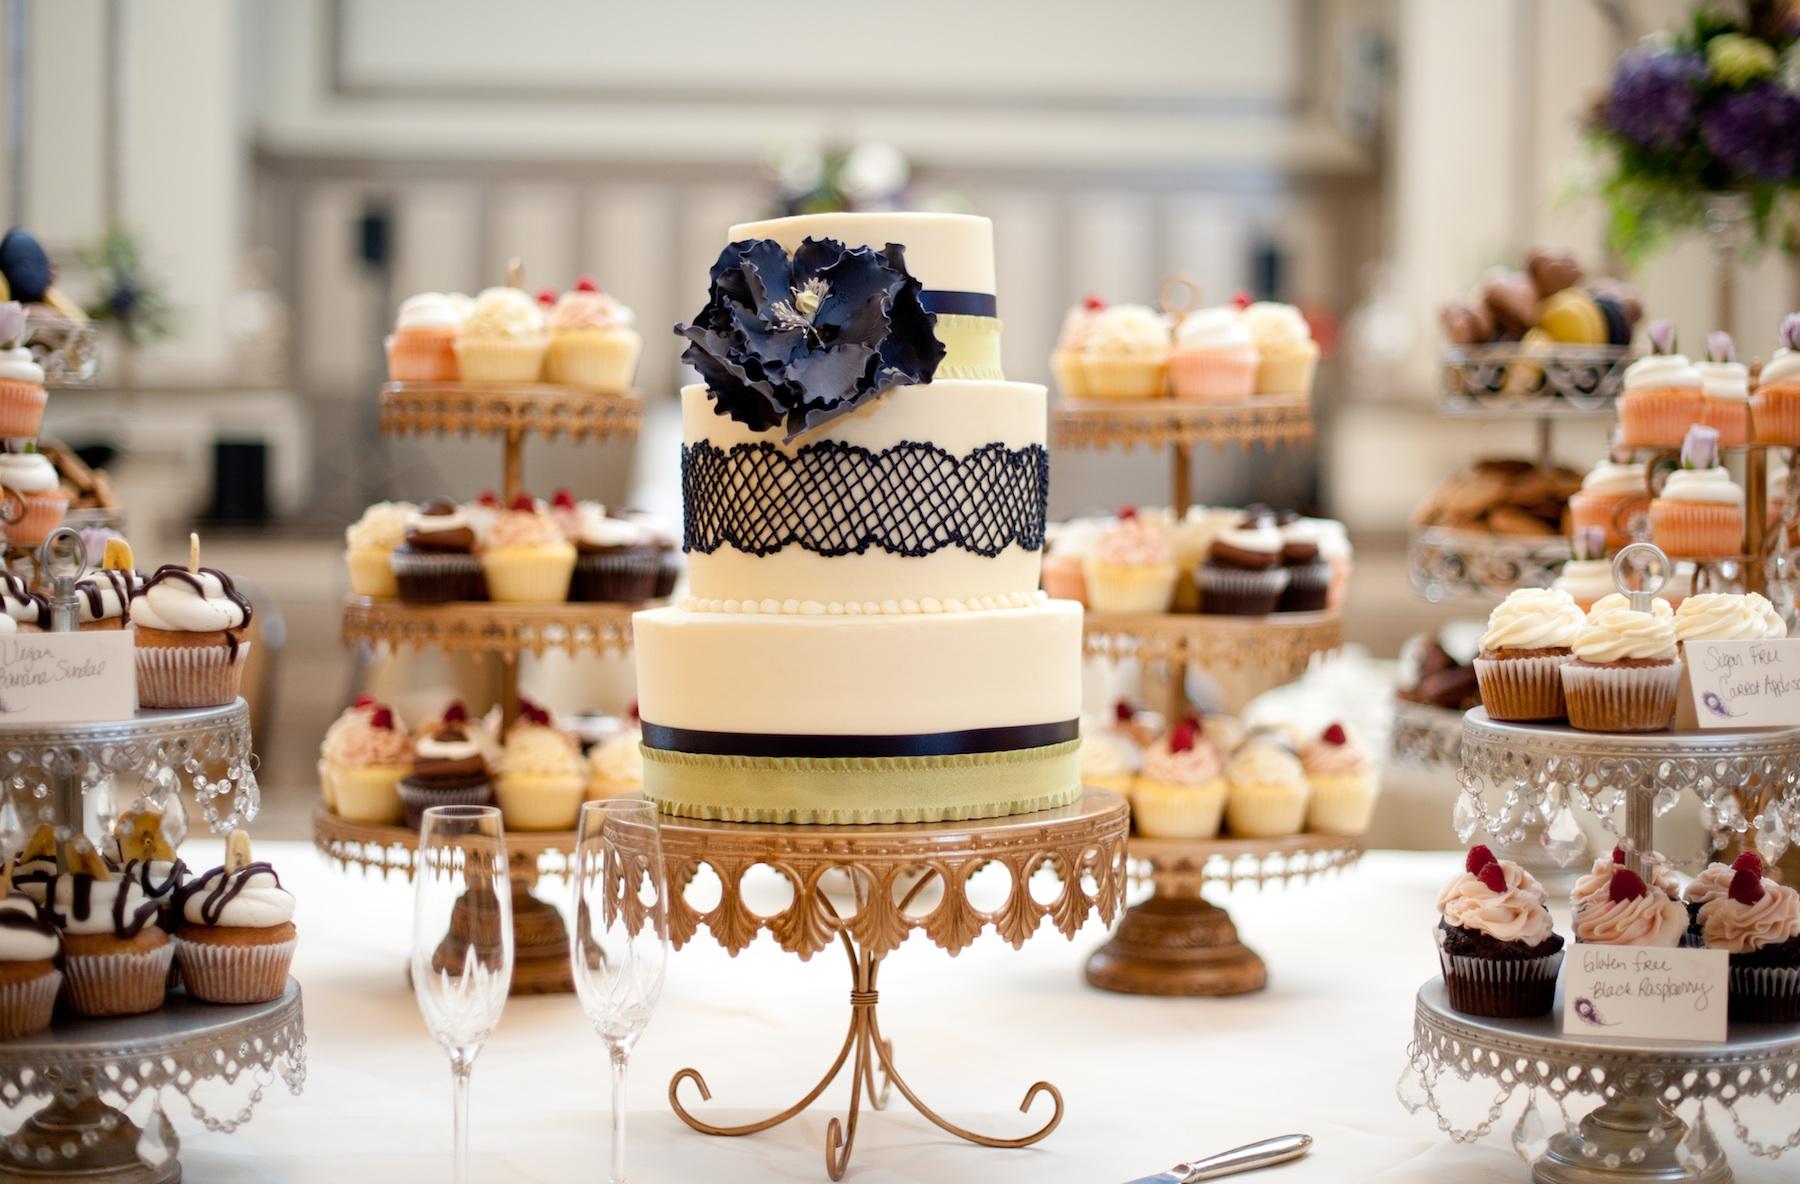 wedding-photography-sneak-peek-elegant-real-wedding-lace-embellished-wedding-cake.original